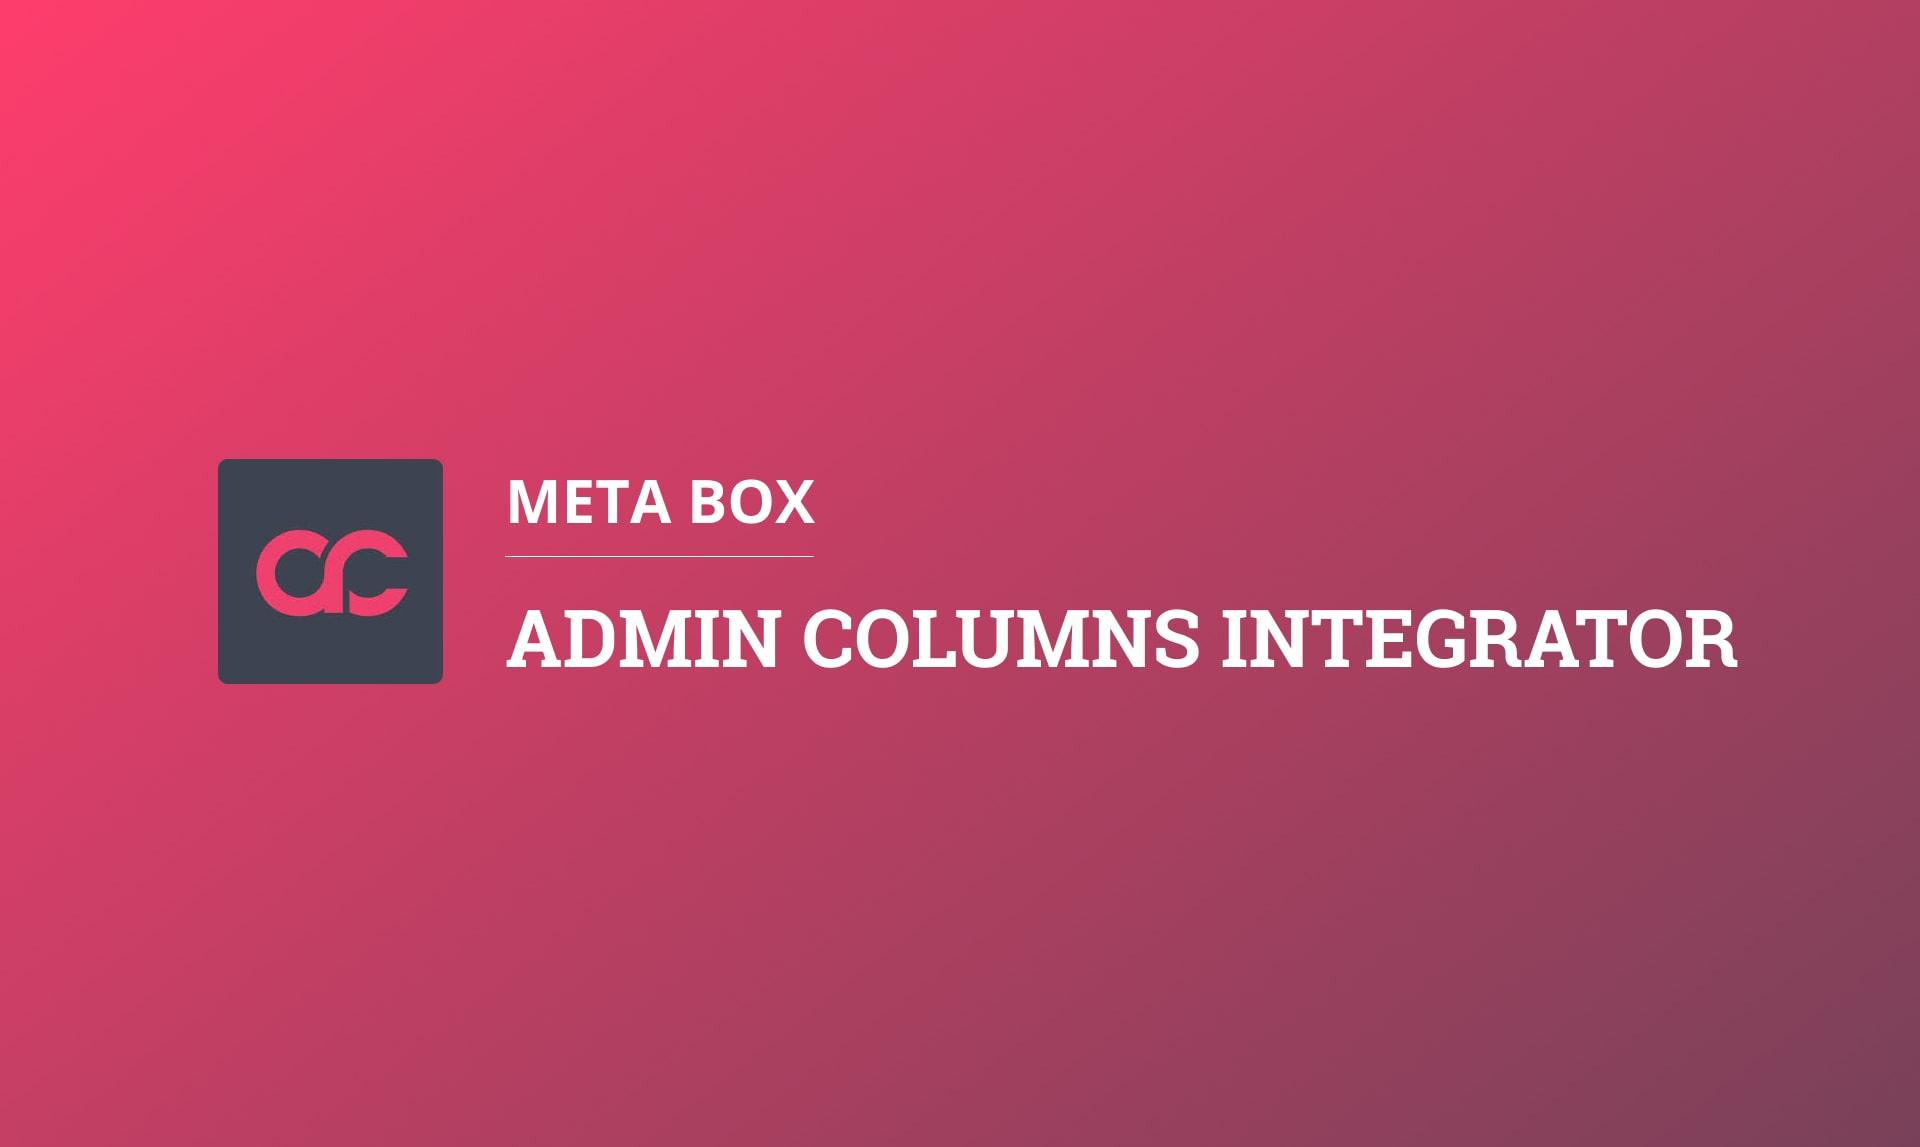 Meta Box - Admin Columns Integrator